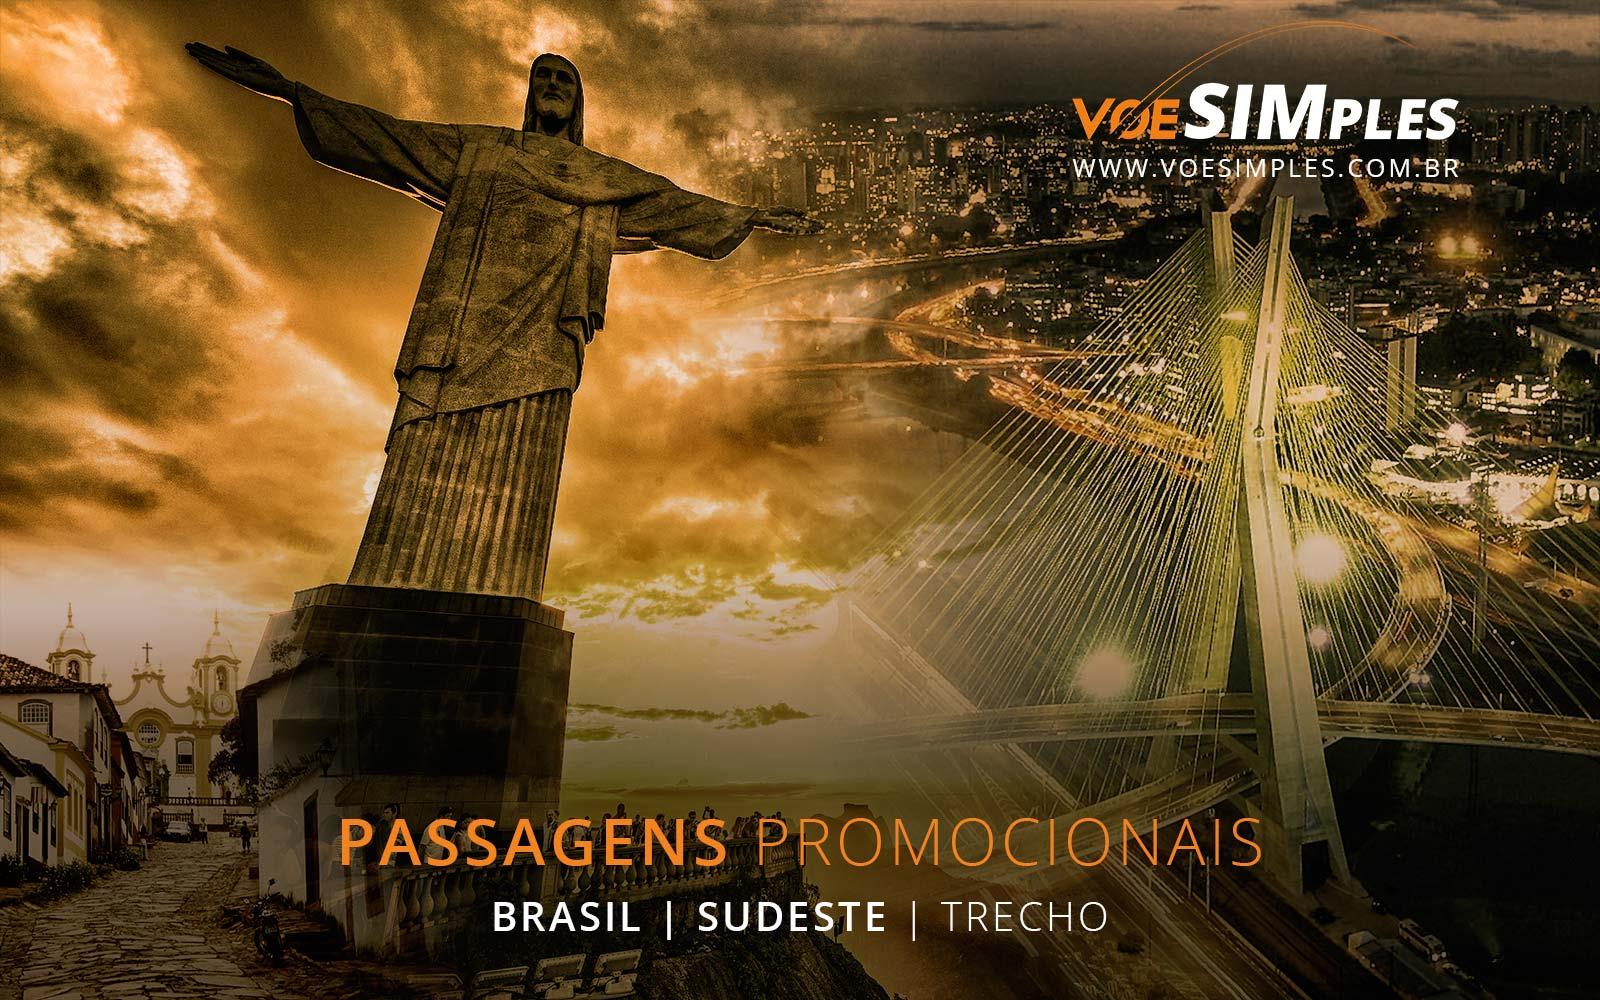 passagens-aereas-promocionais-brasil-voe-simples-passagem-aerea-promocional-barata-promocao-passagem-aviao-passagens-aereas-brasil-sudeste-trecho